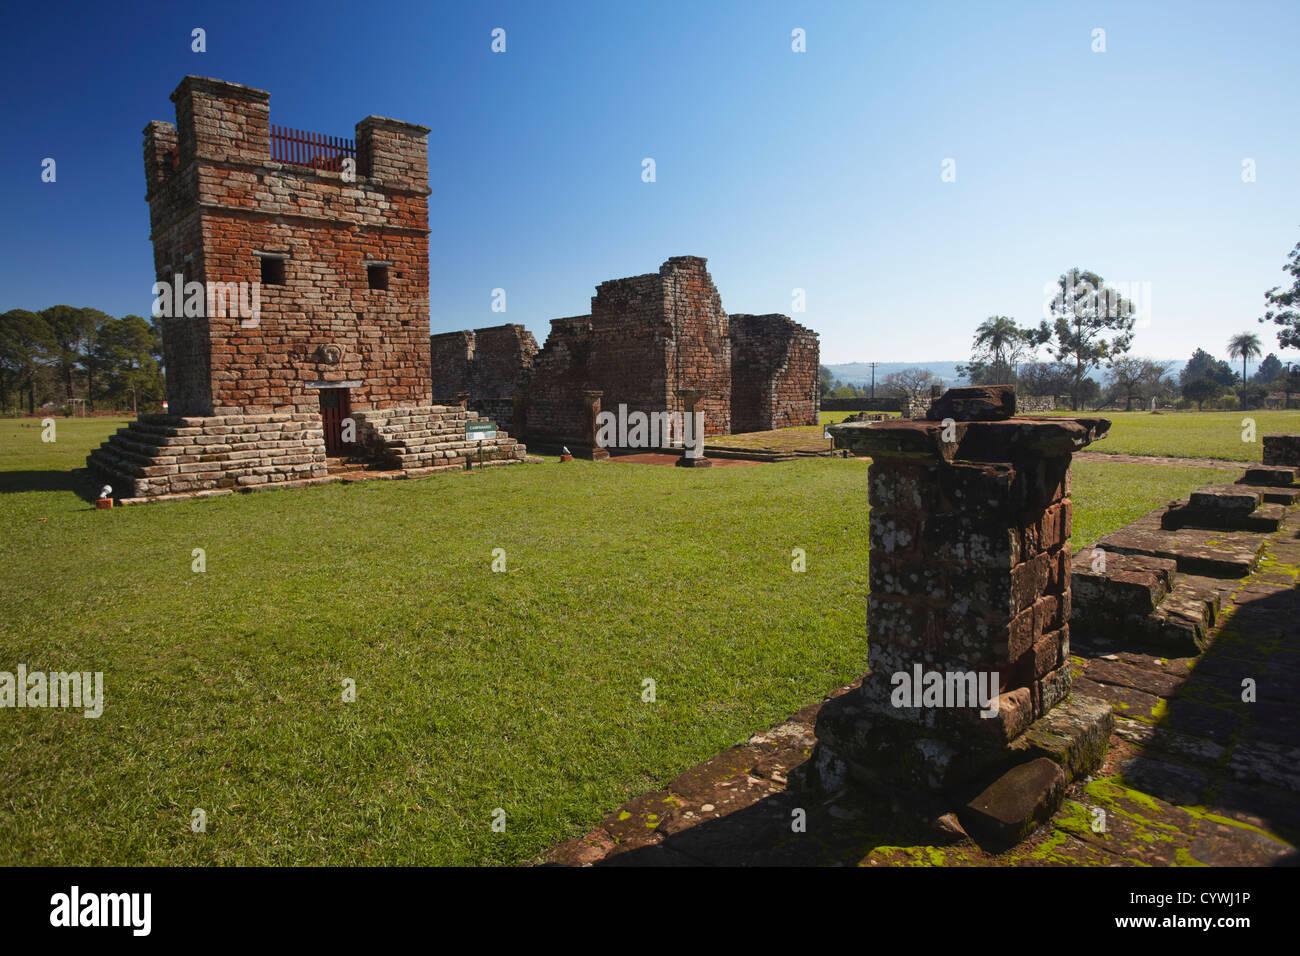 Ruins of Jesuit mission at Trinidad (UNESCO World Heritage Site), Parana Plateau, Paraguay - Stock Image